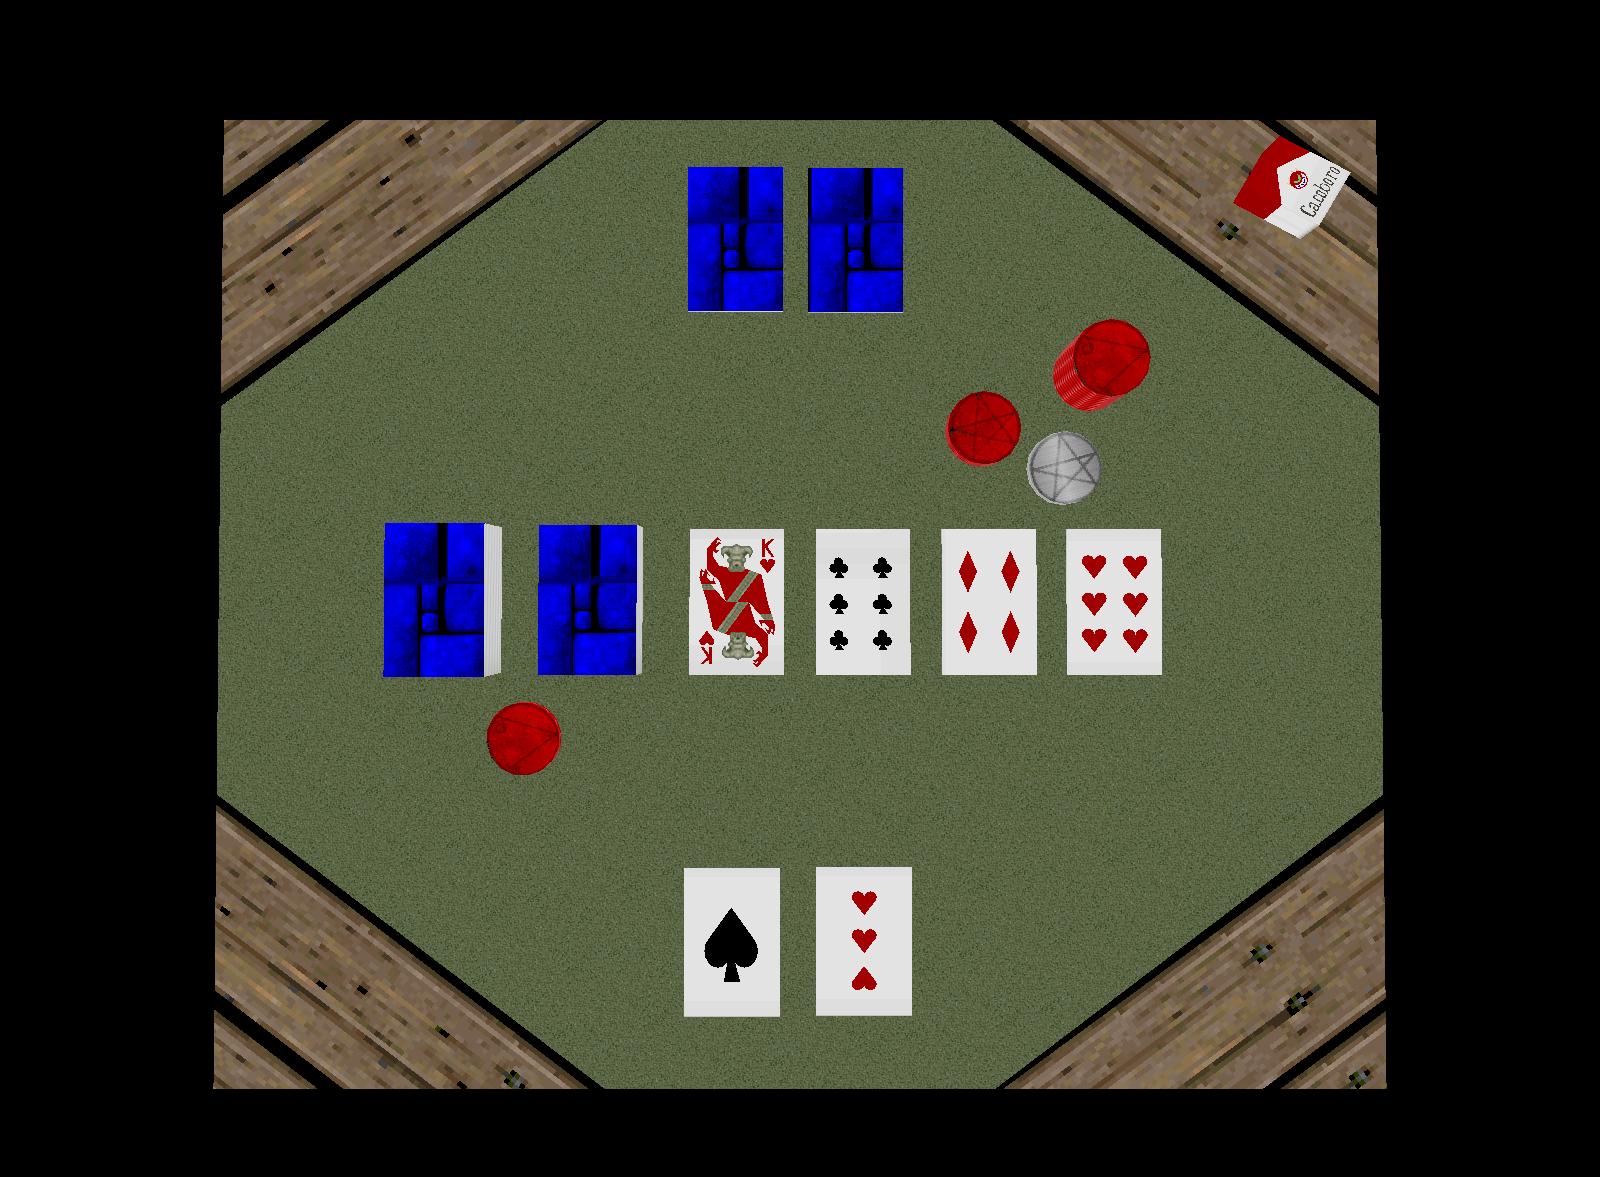 Screenshot_Doom_20210728_194850.png.a6f1407d0d74a4c54d1ea59de783d243.png